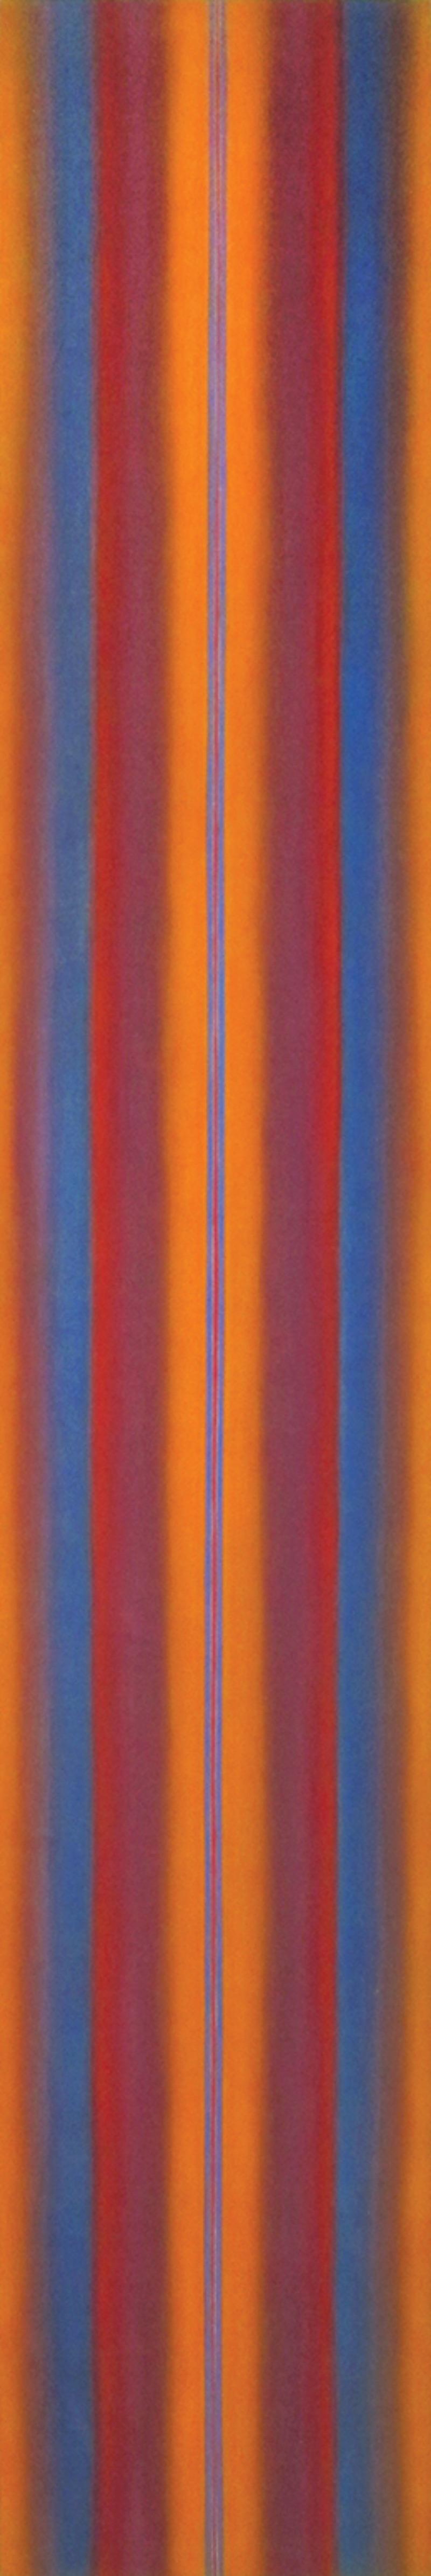 Leon Berkowitz, Oblique, 1975